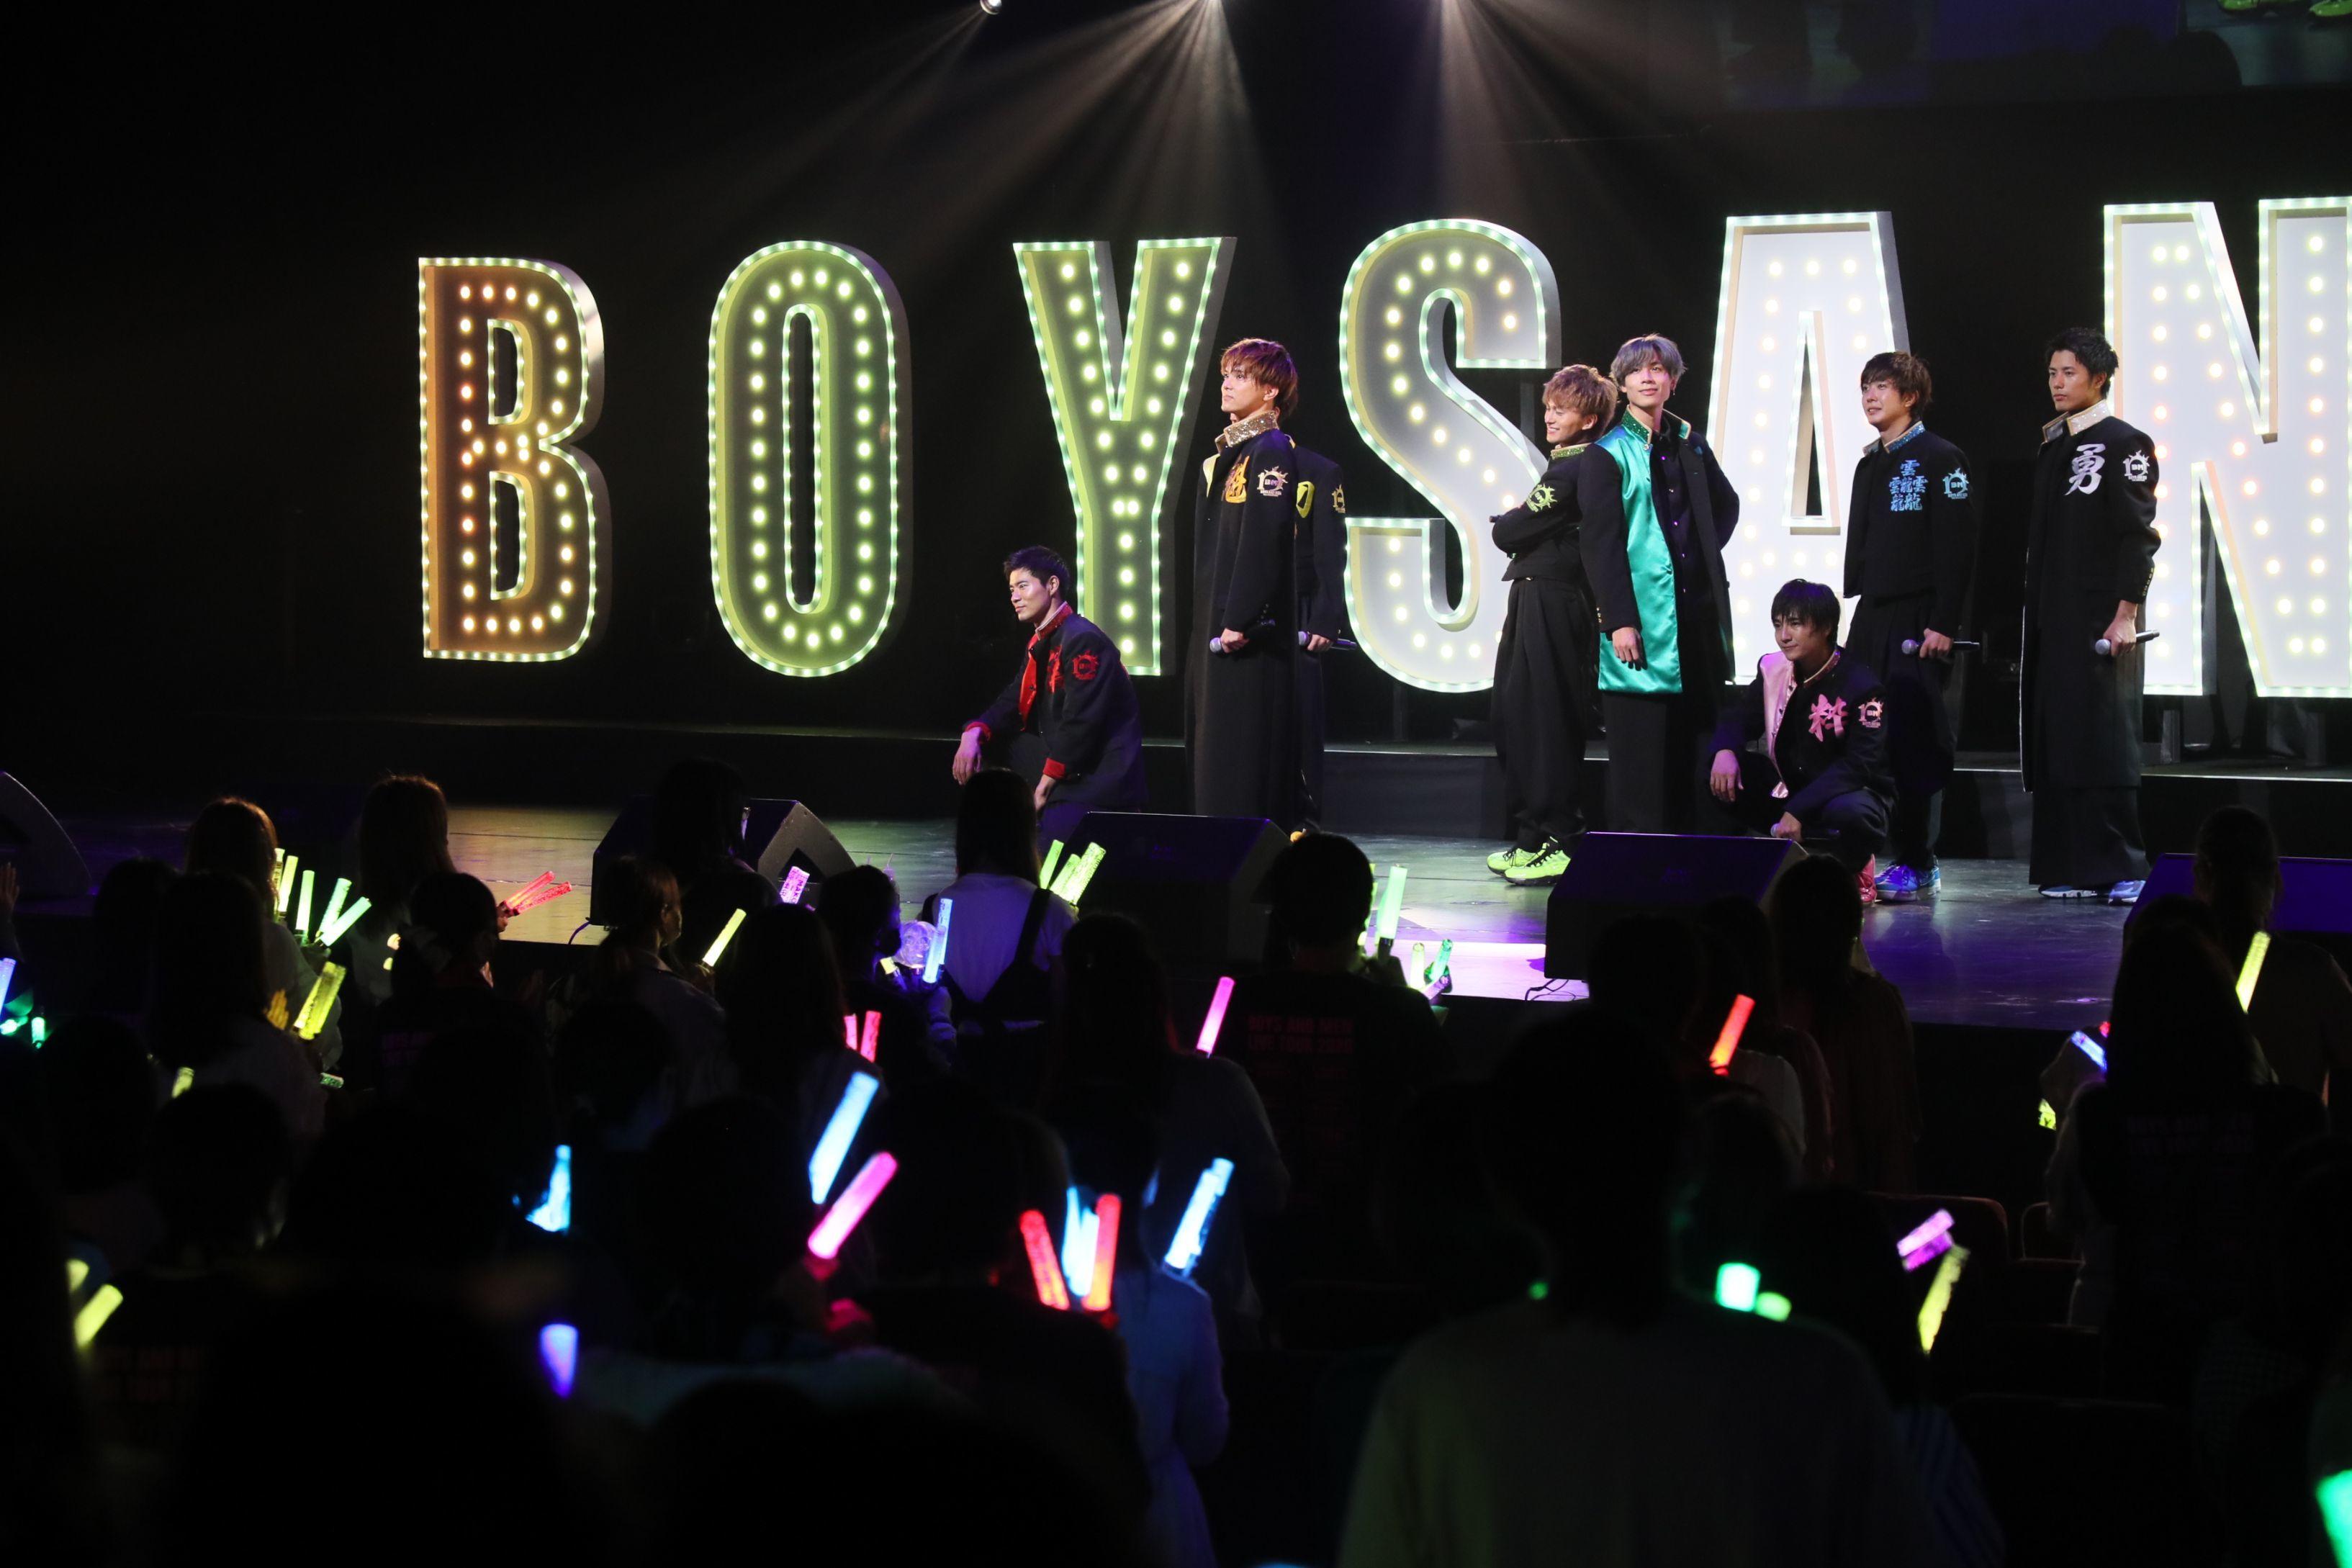 『BARI BARI★PARTY』愛知県芸術劇場大ホール